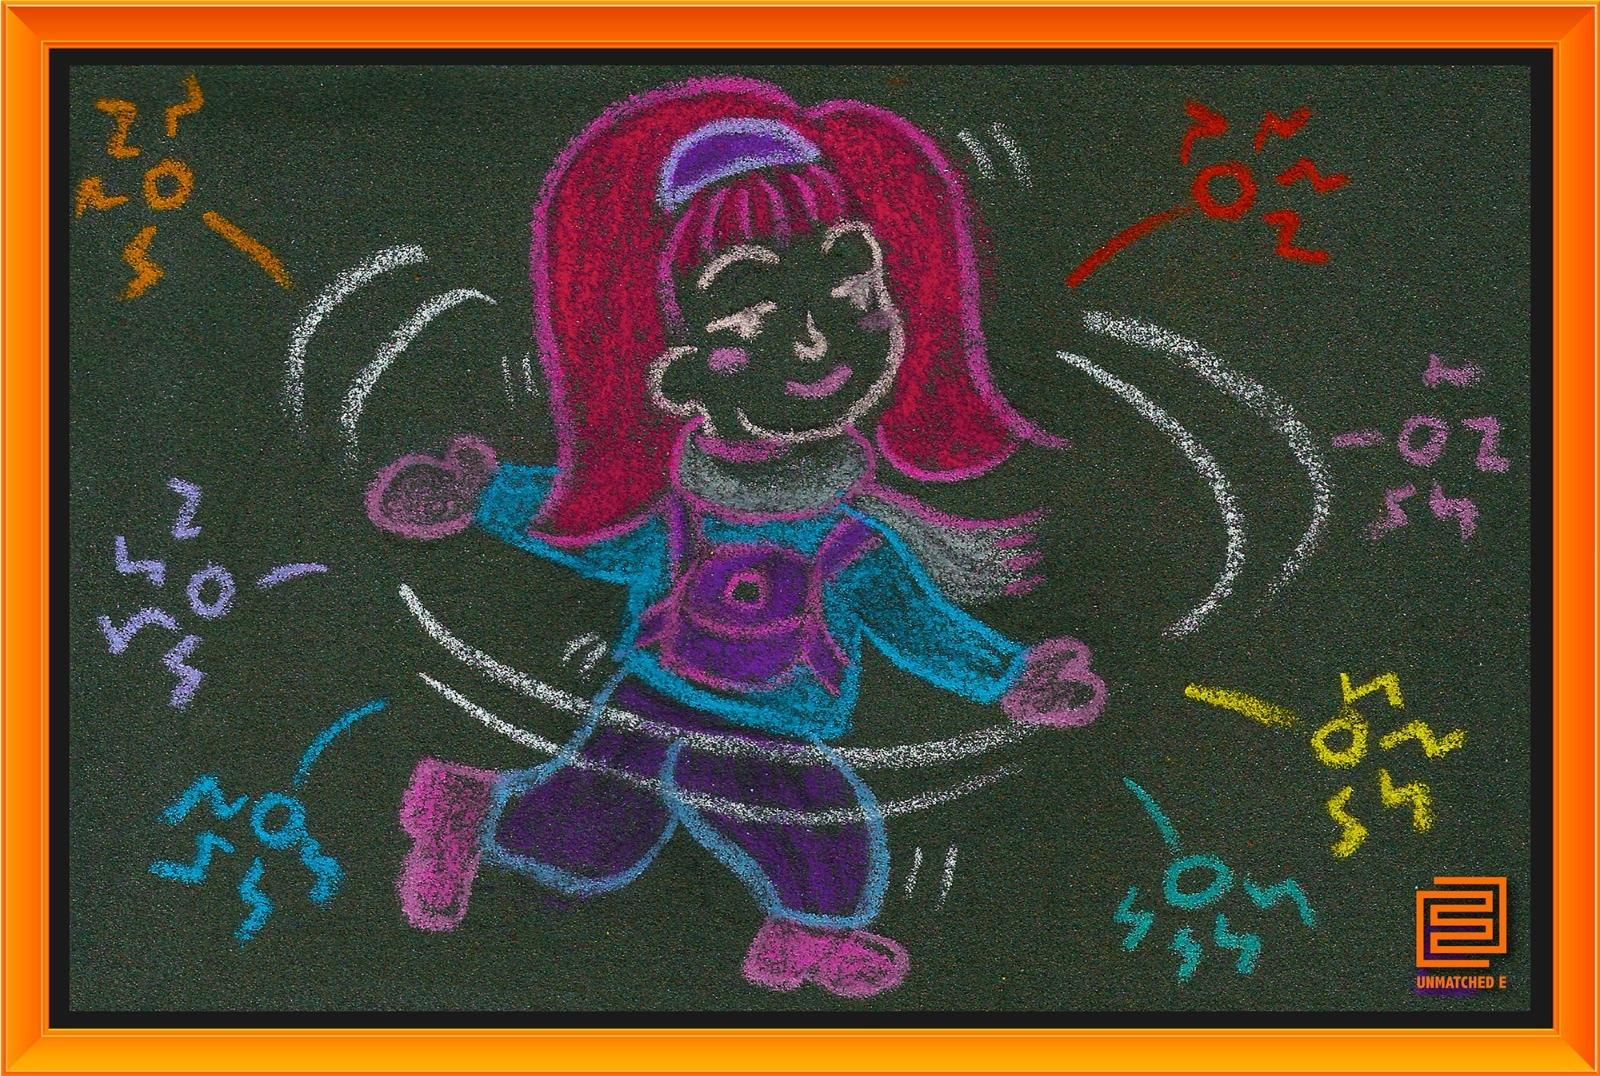 [e漫绘]我这样在砂纸上创作科幻小漫画 - 砂纸画教程